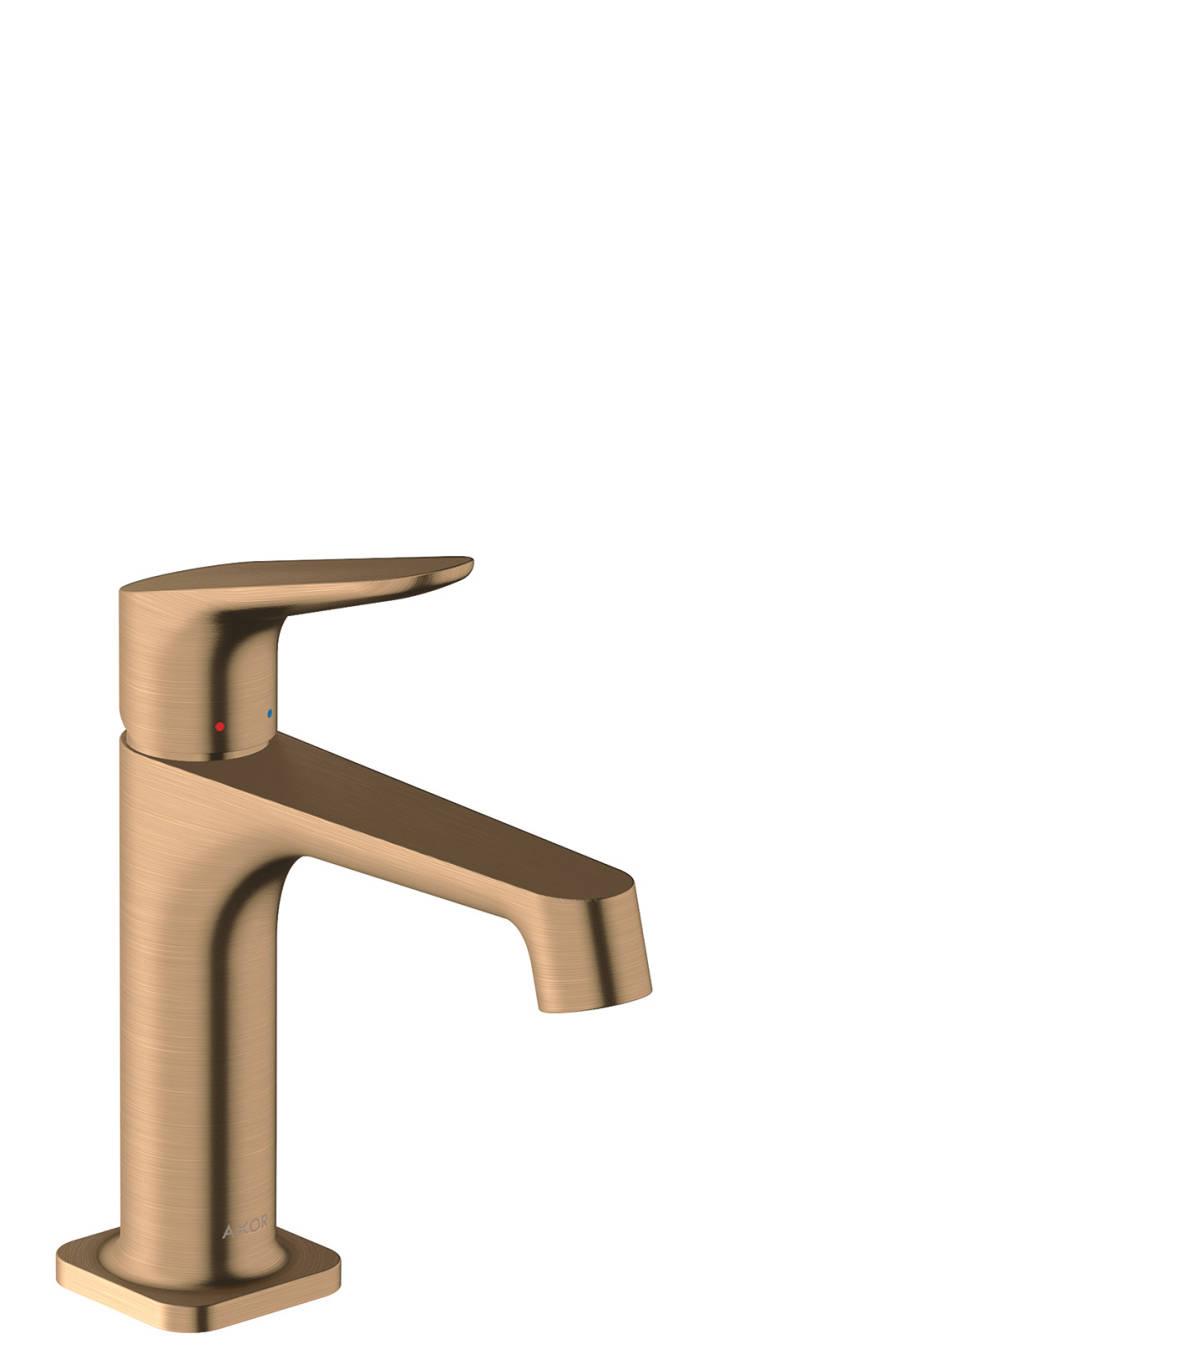 Single lever basin mixer 100 with pop-up waste set, Brushed Bronze, 34010140